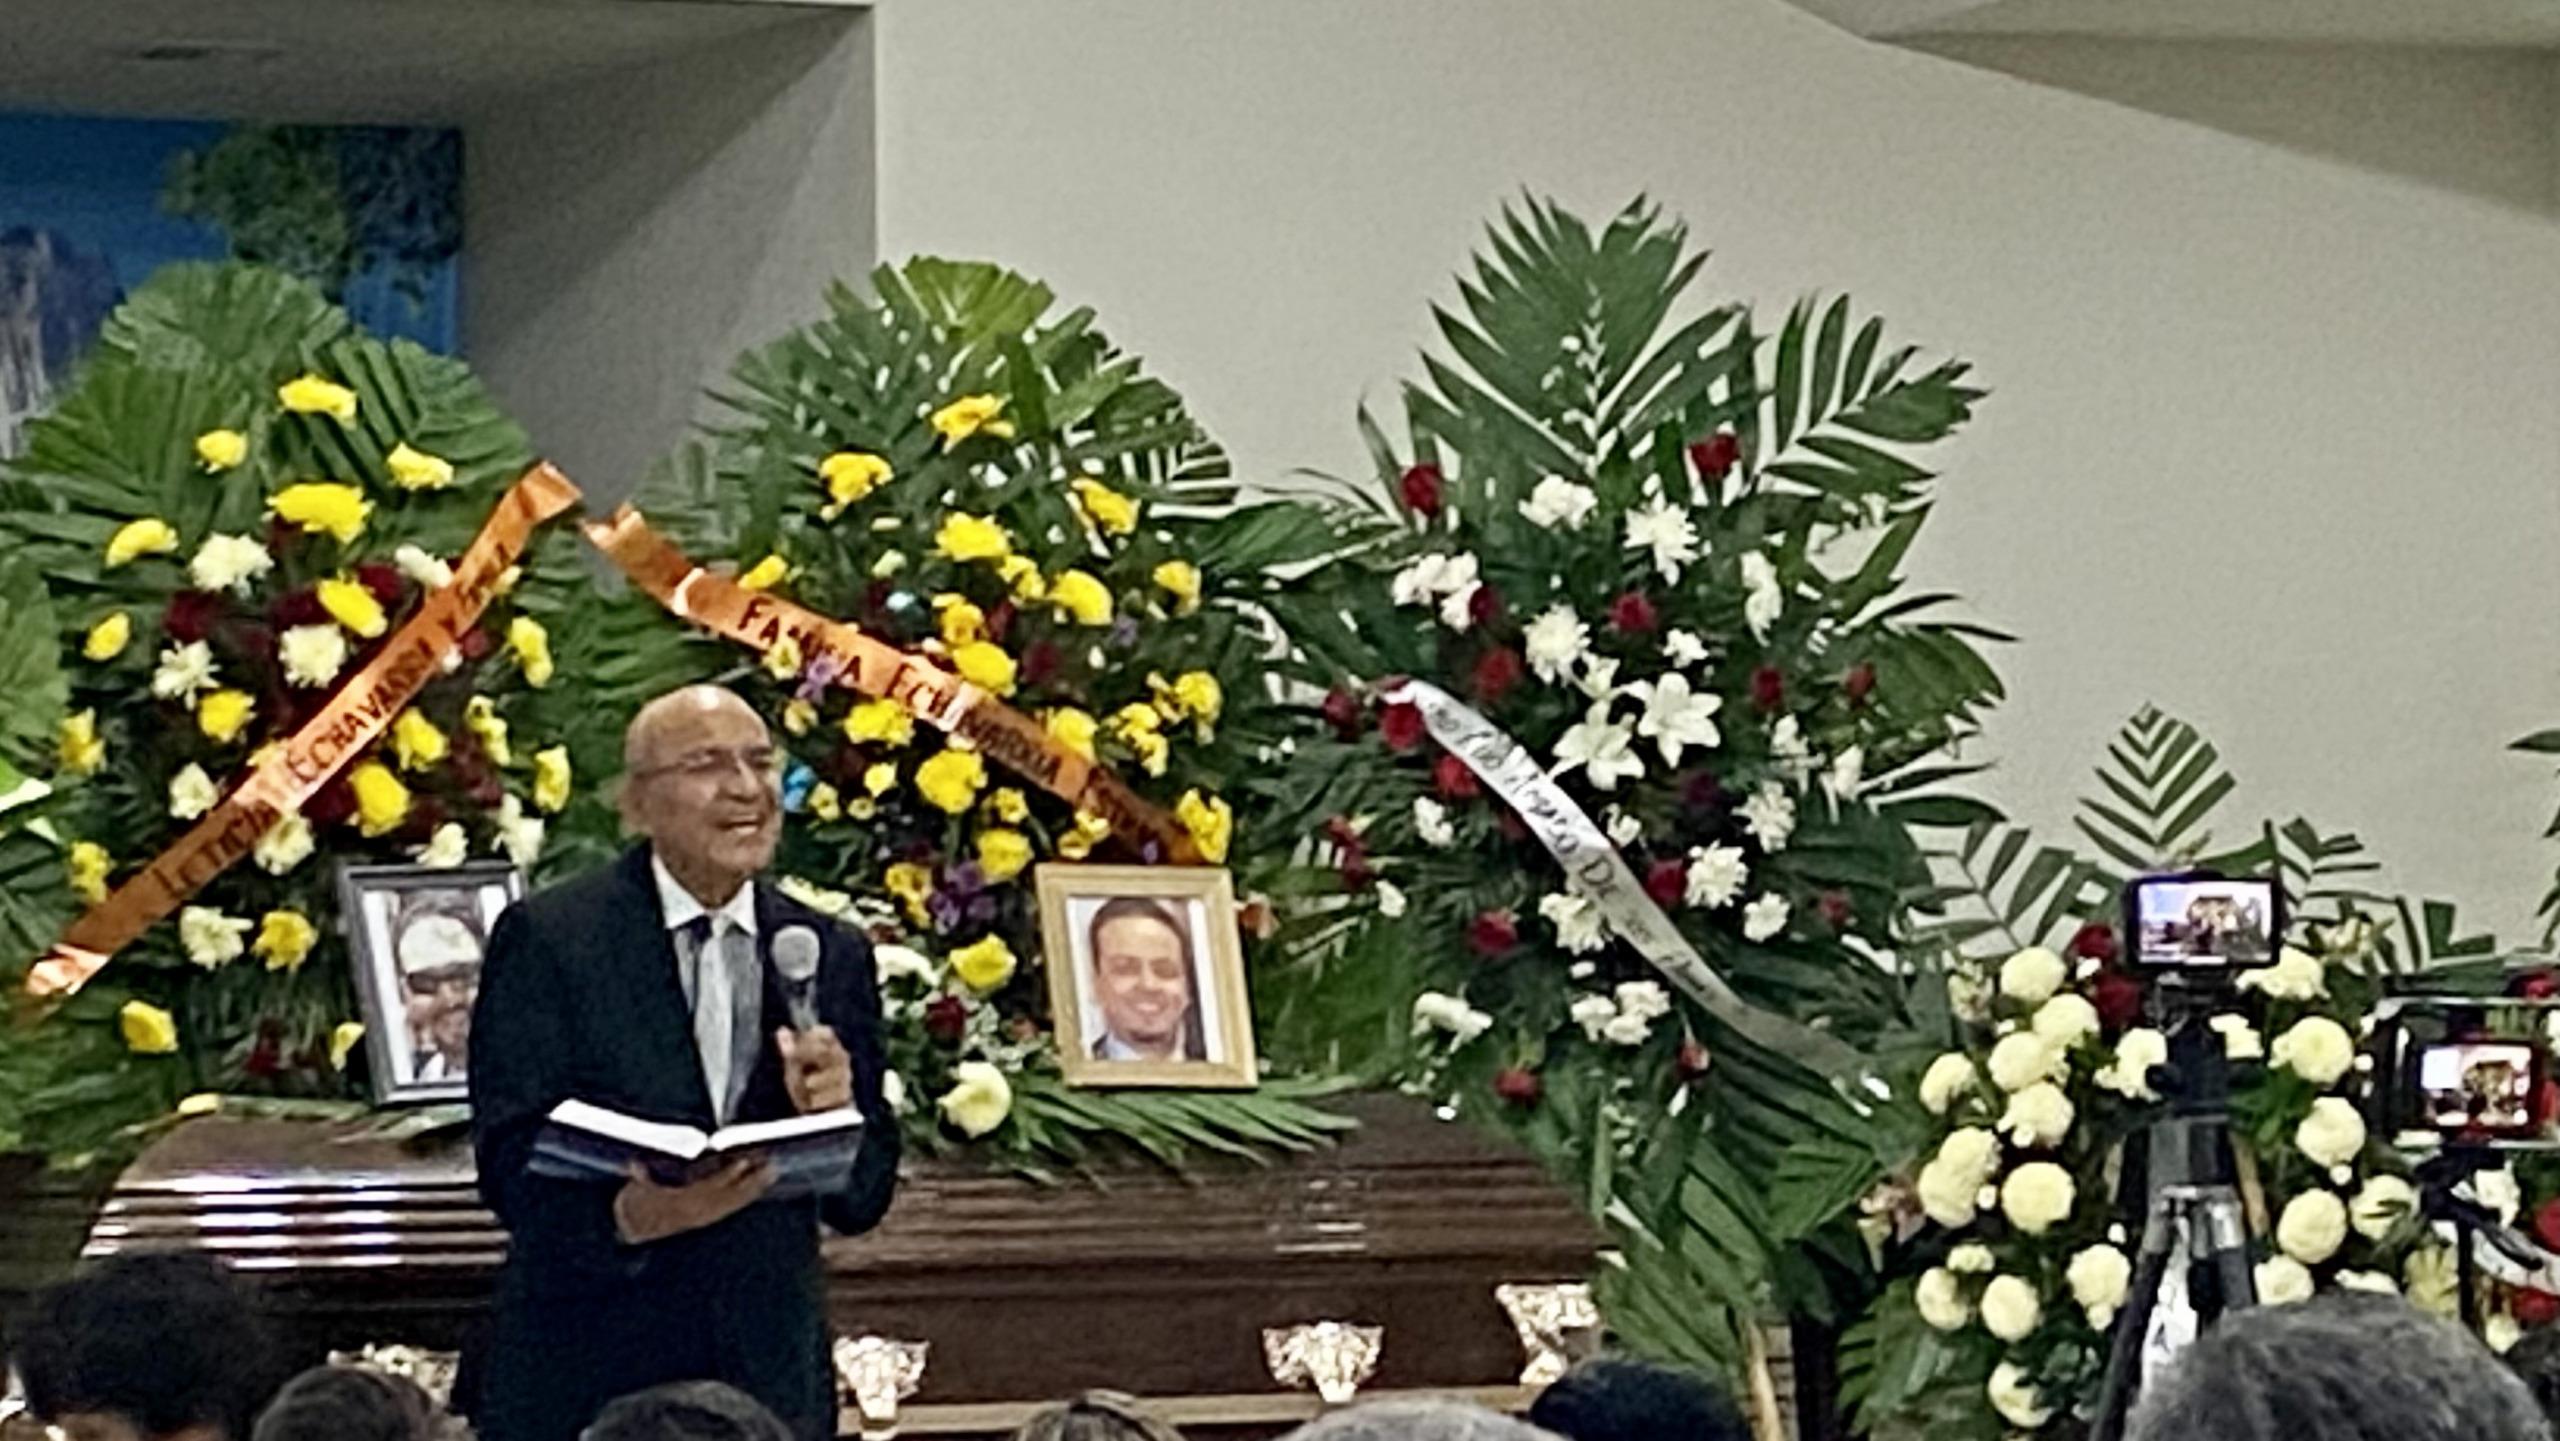 Remembering Abner Escobar Portillo